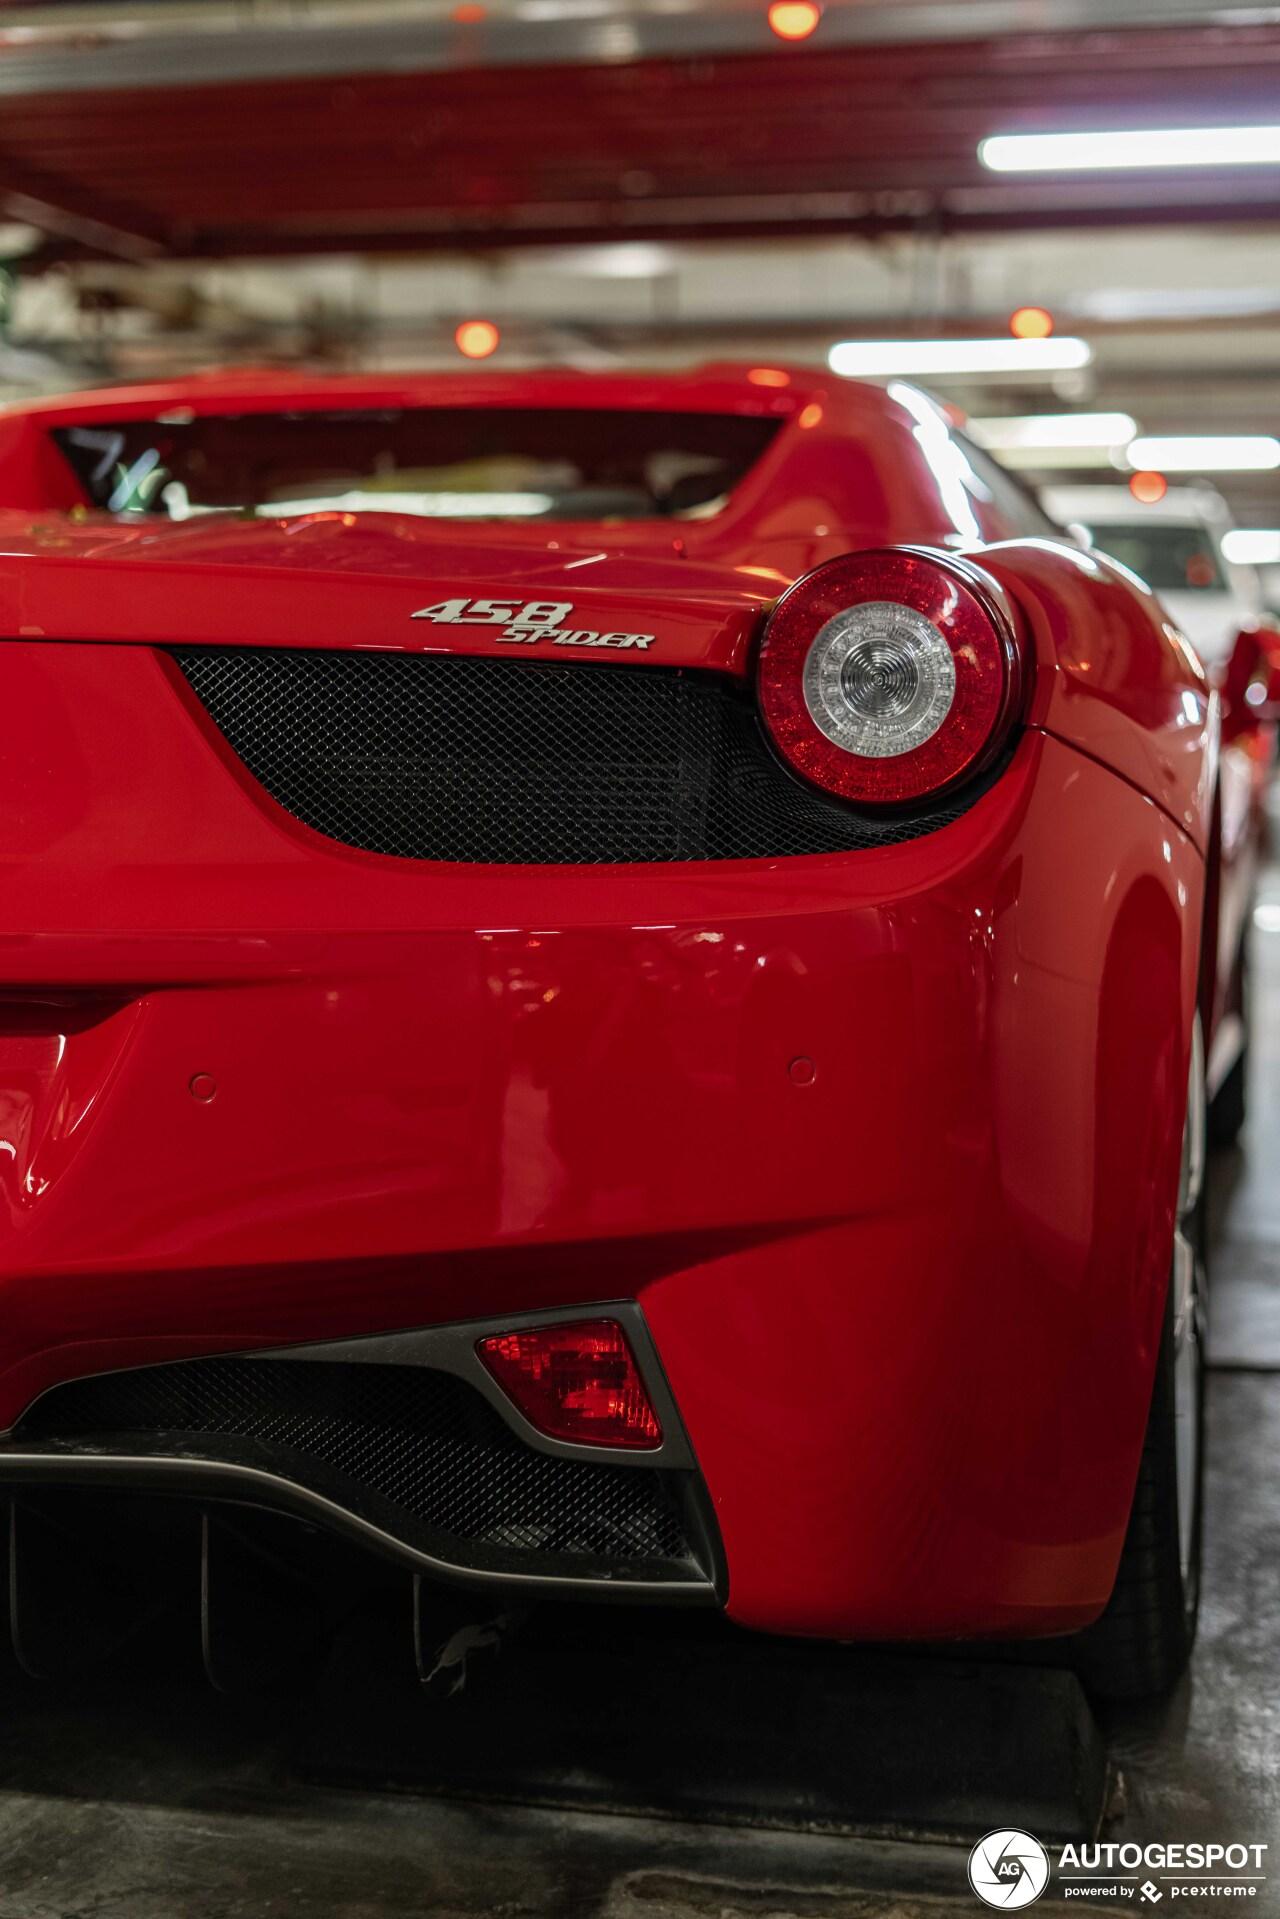 Ferrari 458 Spider - 9 June 2019 - Autogespot